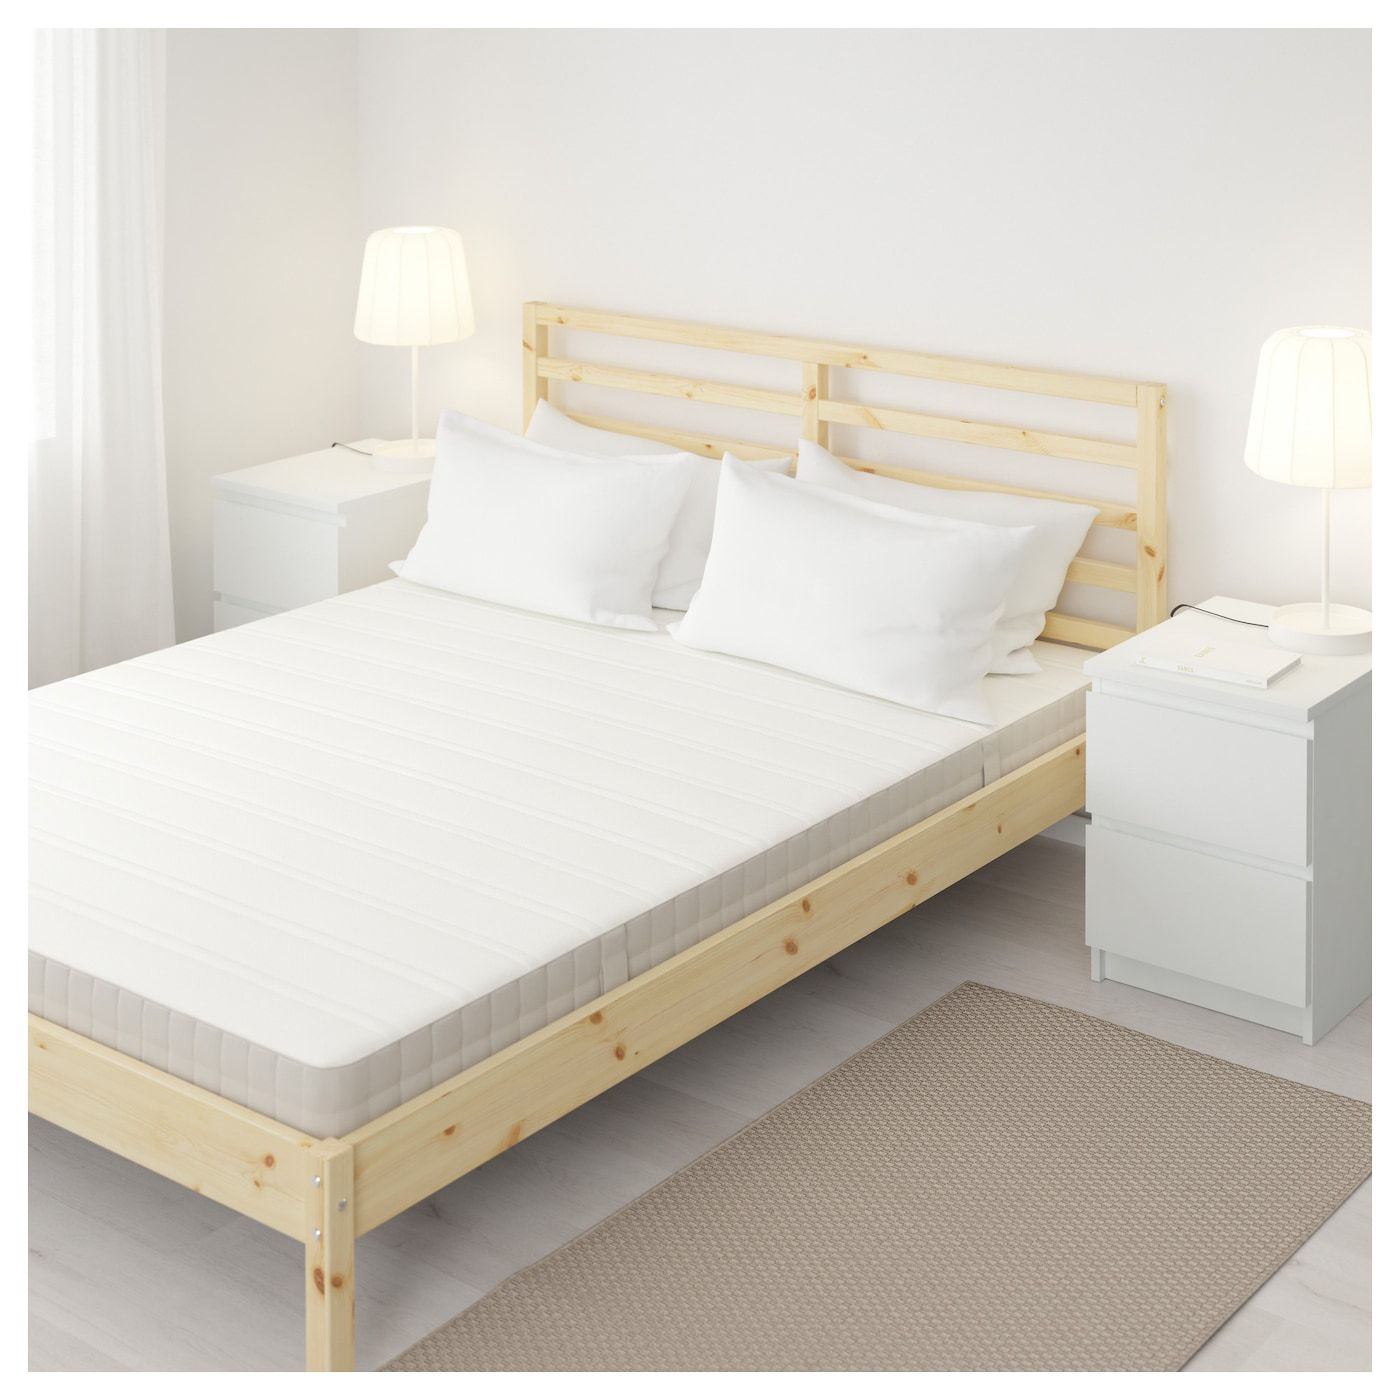 Hasvag Spring Mattress Medium Firm Beige Full Ikea Mattress Loft Bed Frame Malm Bed Frame